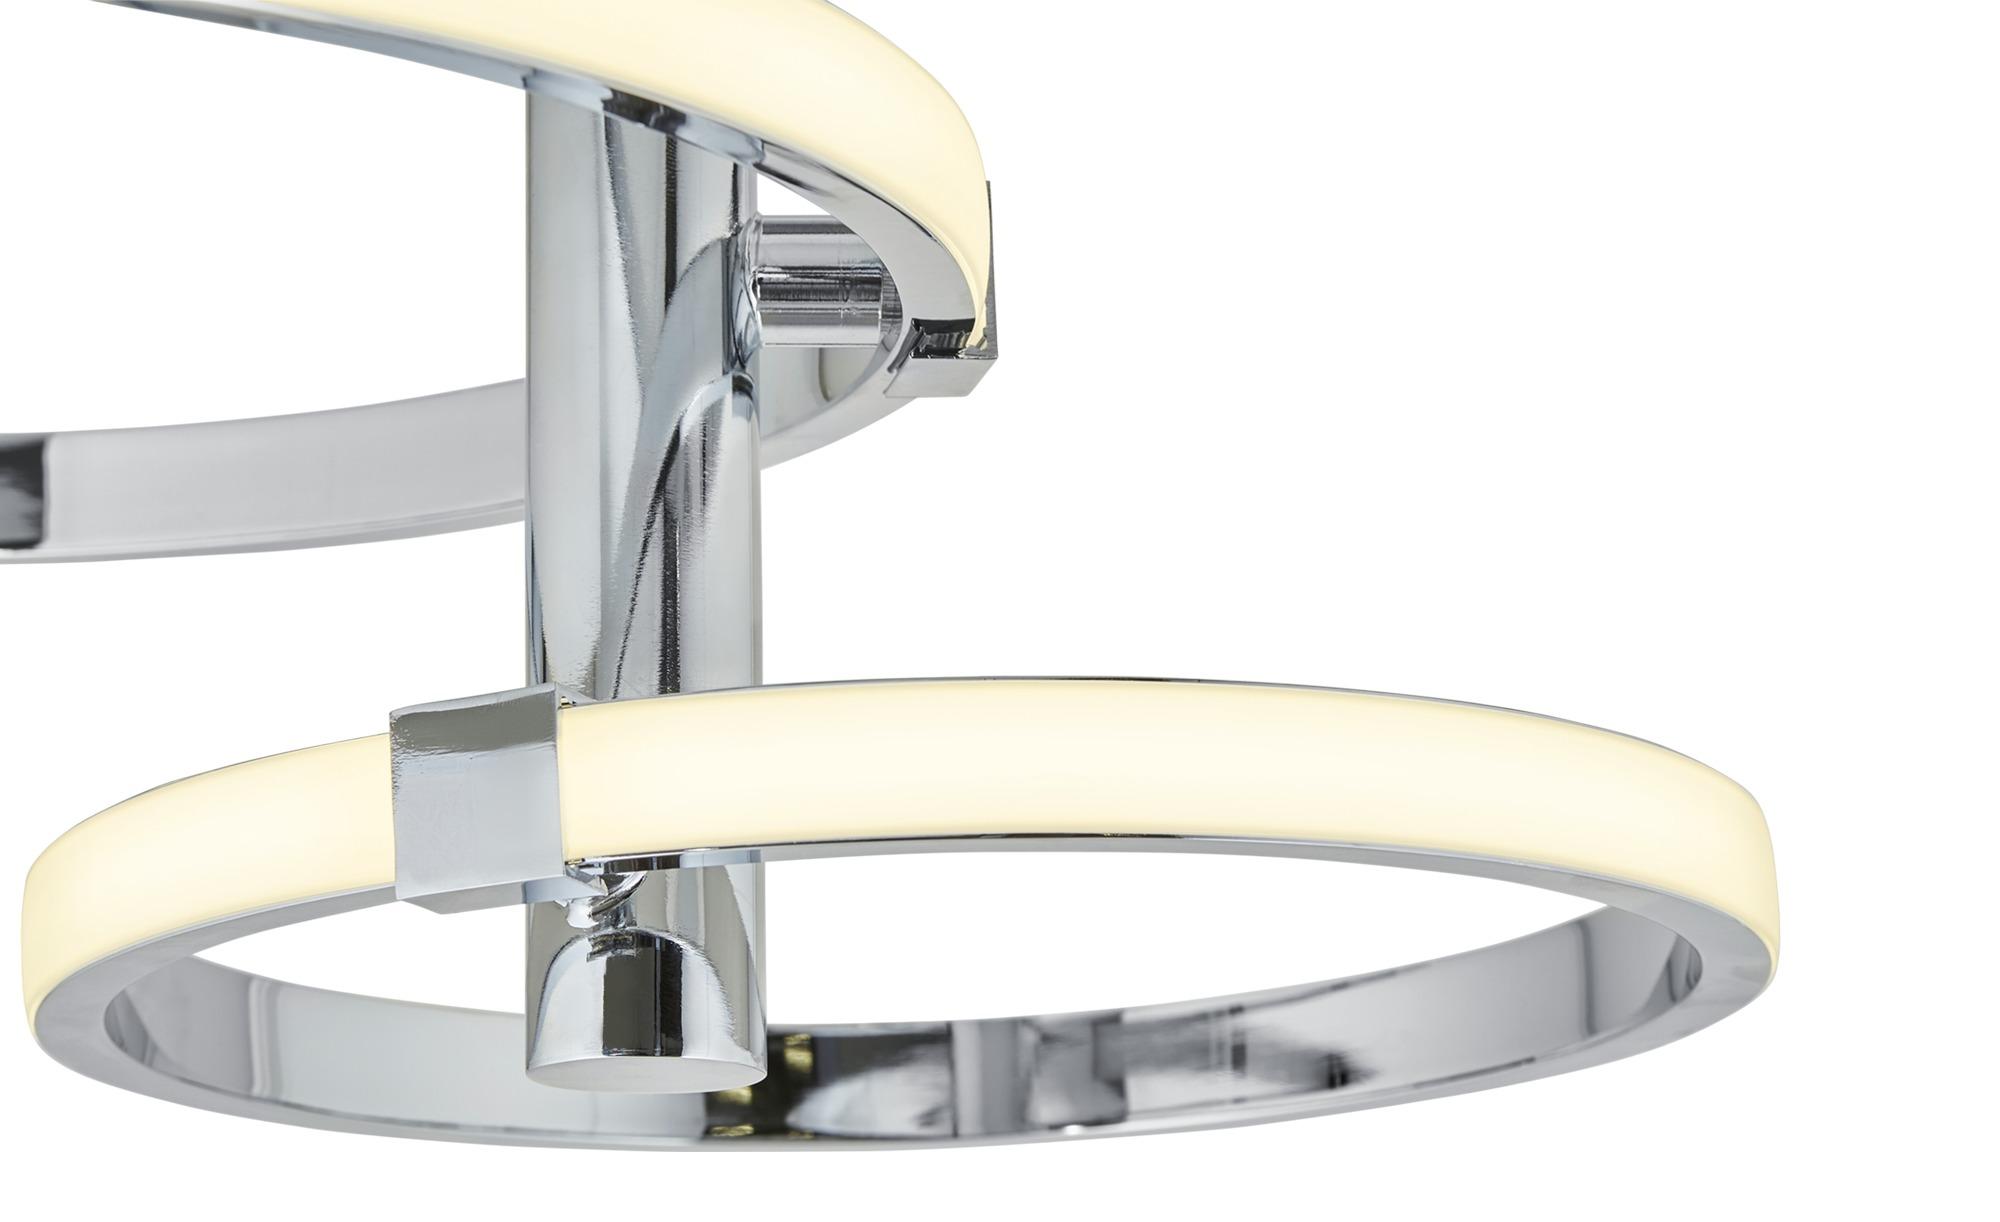 KHG LED-Deckenleuchte, Ringe ¦ silber ¦ Maße (cm): B: 57 H: 40 Ø: [57.0] Lampen & Leuchten > Innenleuchten > Deckenleuchten - Höffner